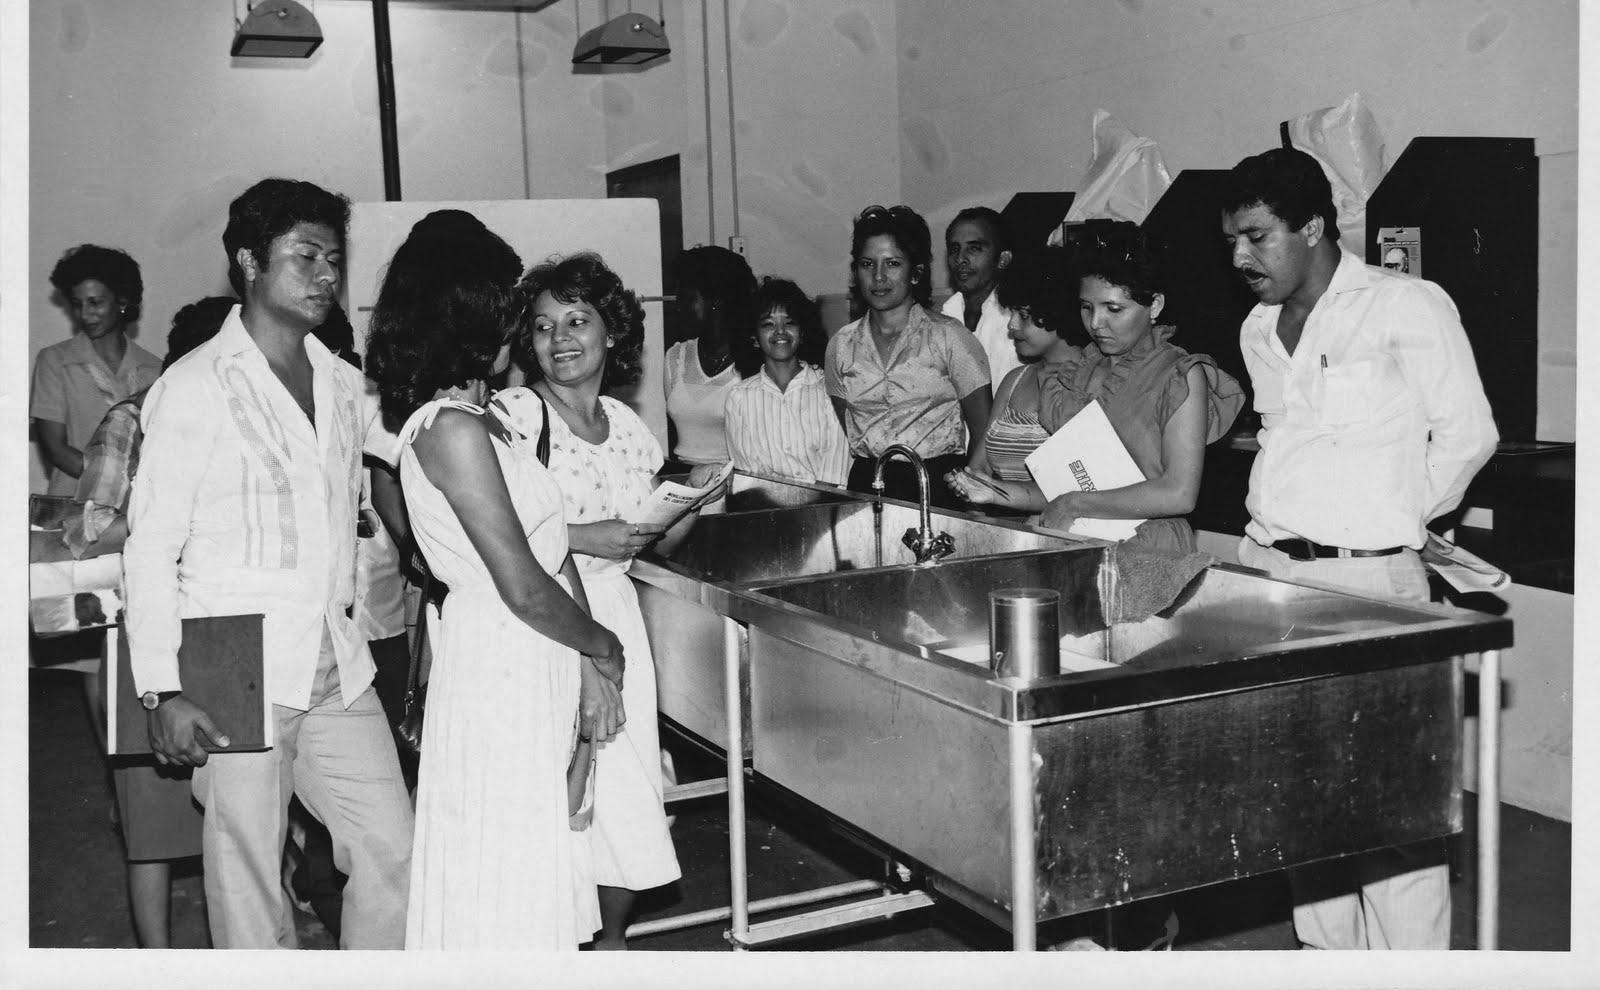 Remembranzas blog de la escuela de periodismo de panam for Cuarto oscuro fotografia